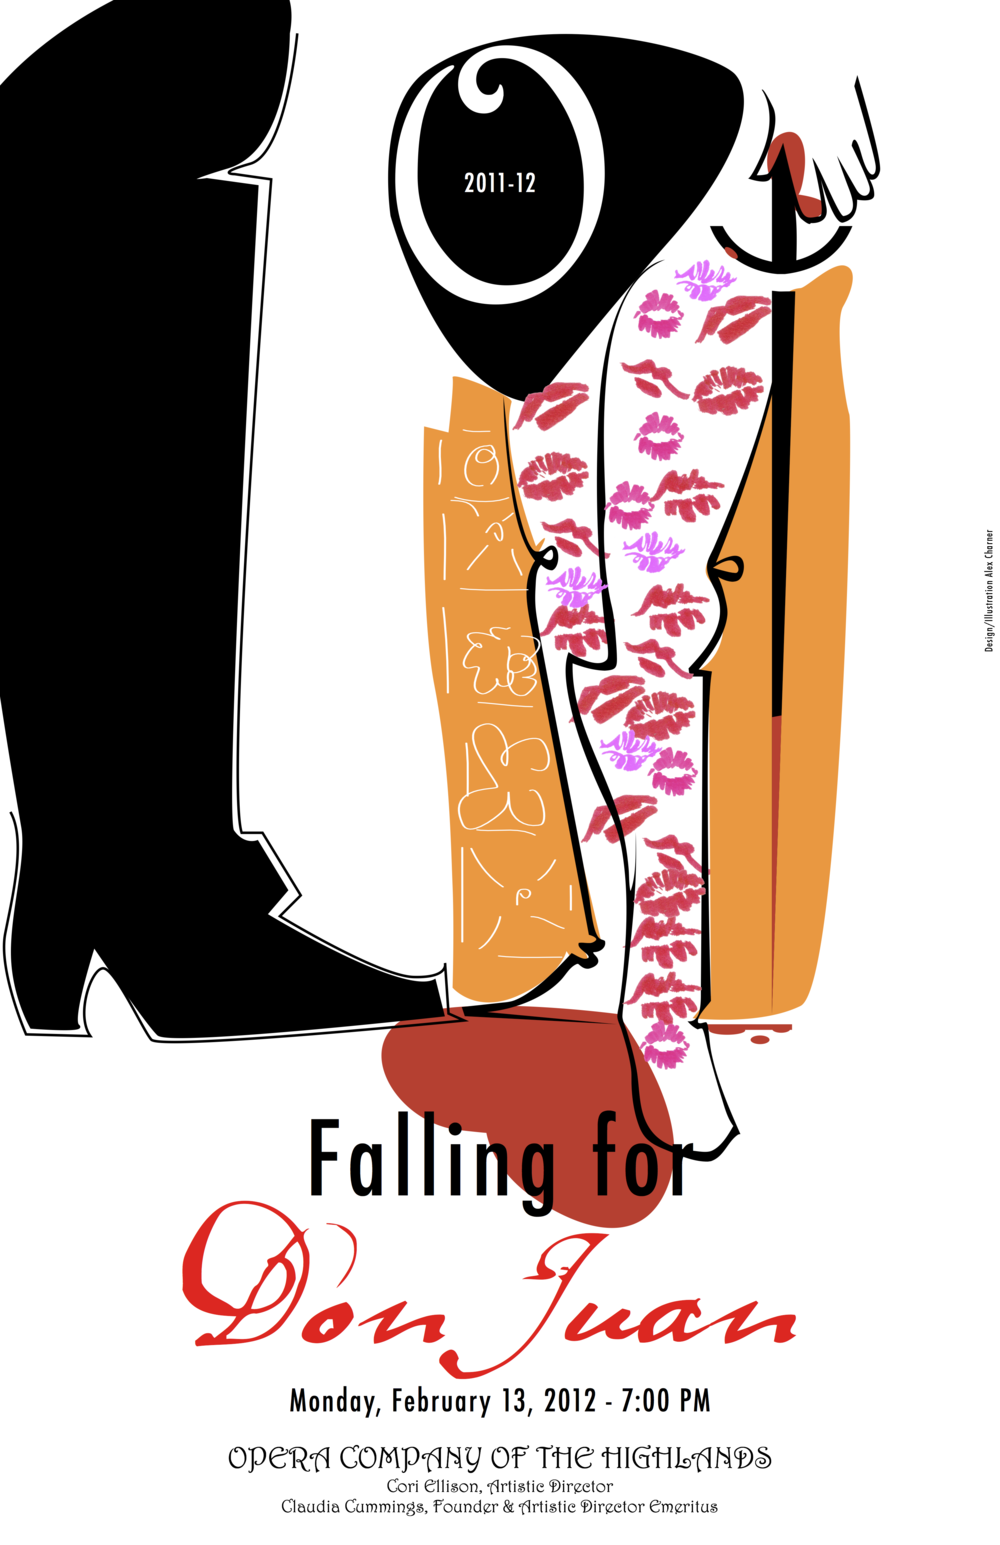 Falling for Don Juan